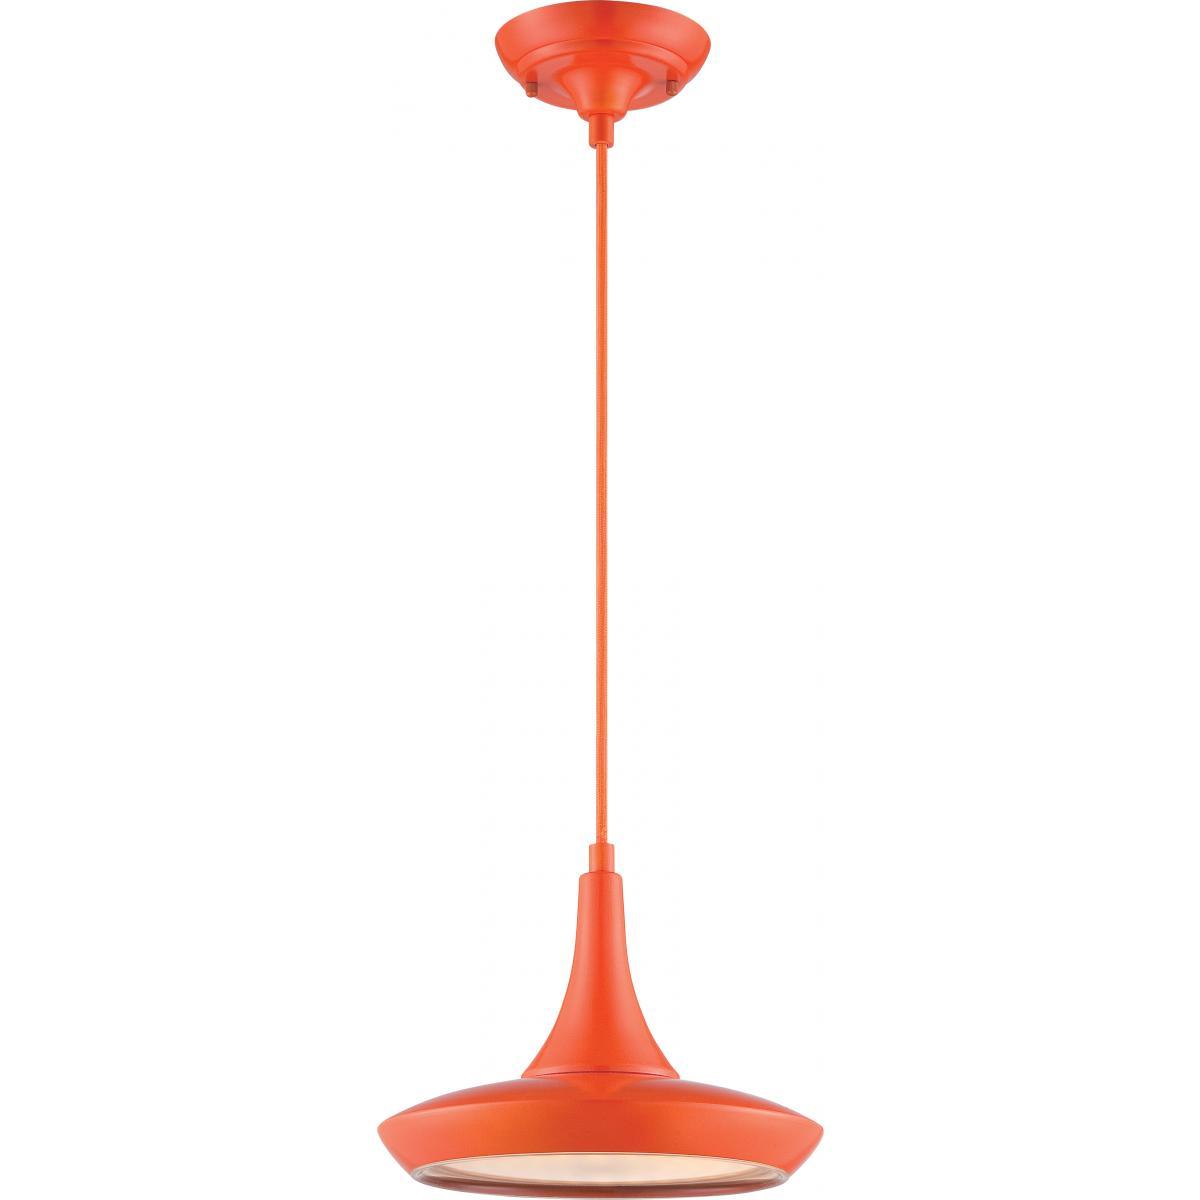 62-446 FANTOM LED PENDNT W/RAYON WIRE